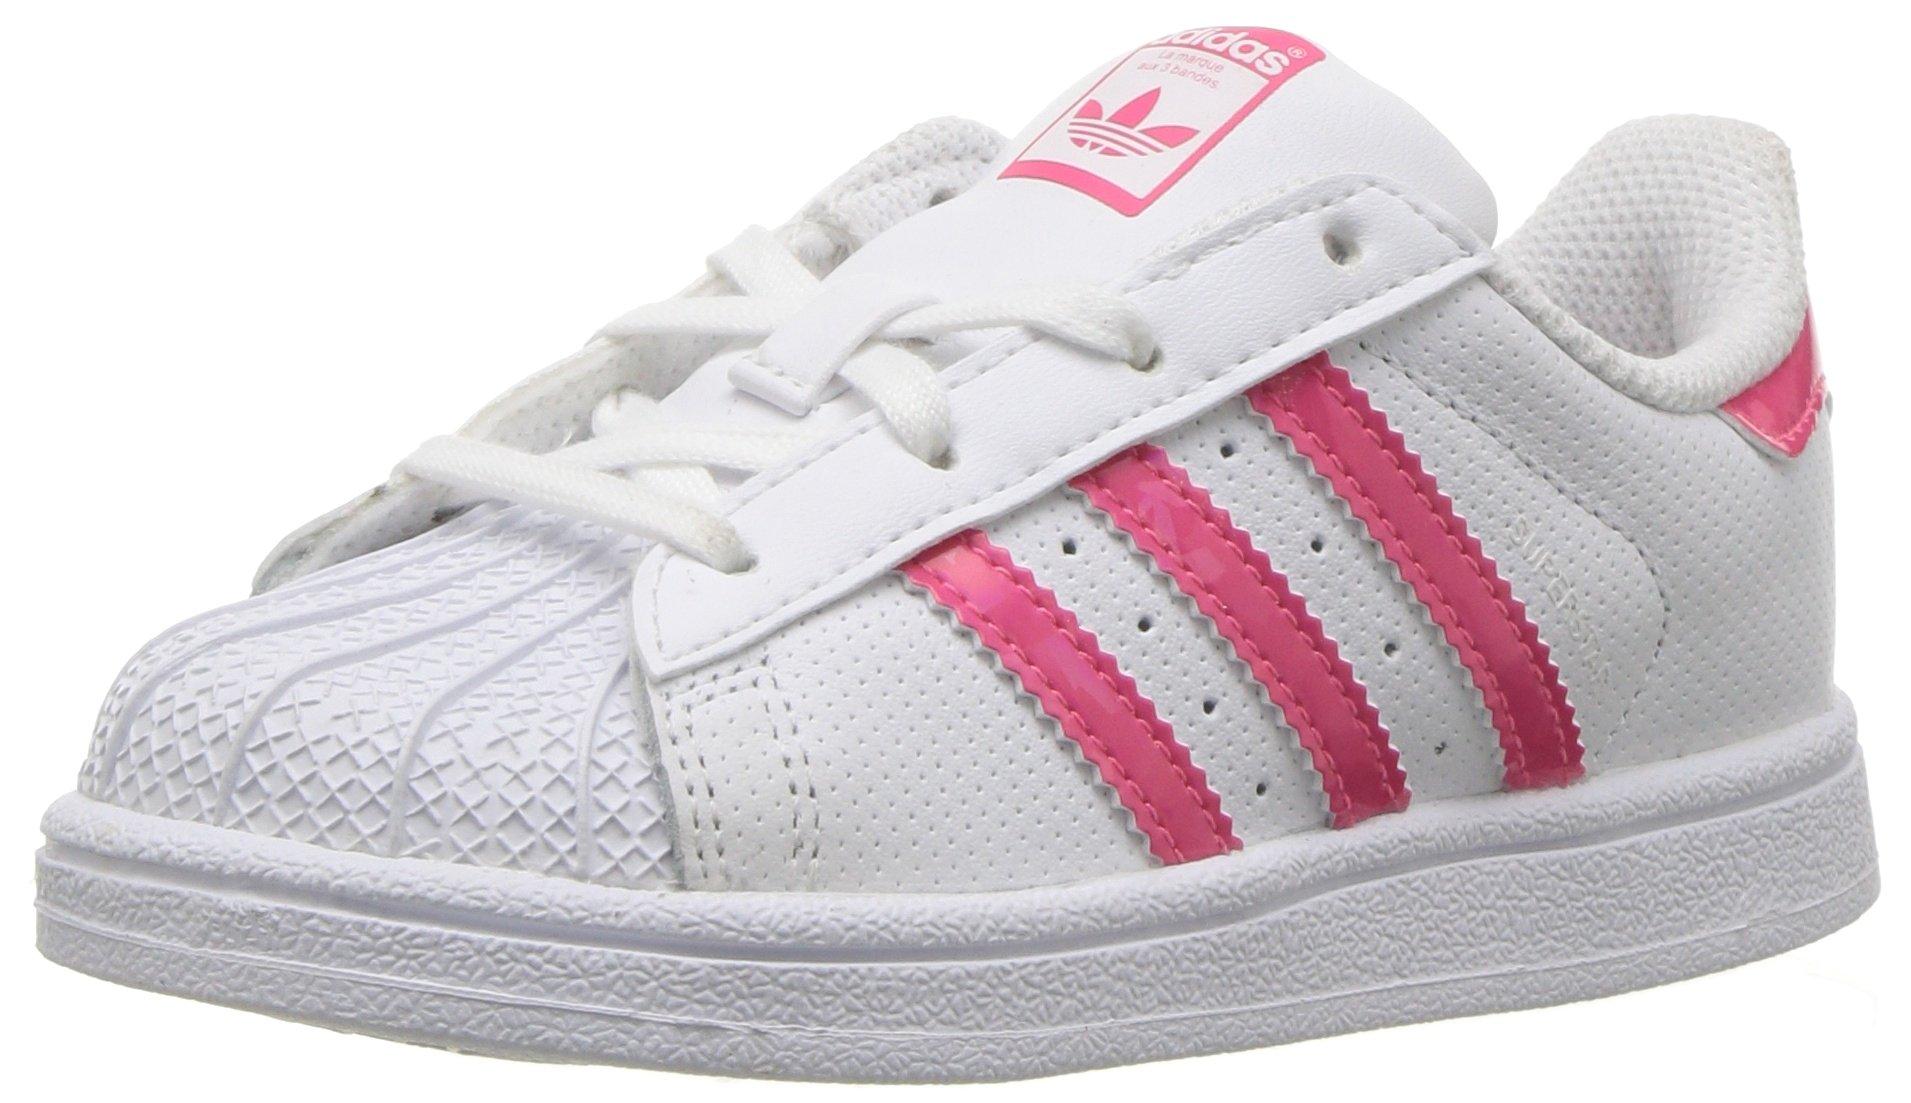 adidas Originals Baby Superstar I, White/Real Pink/White, 6 M US Toddler